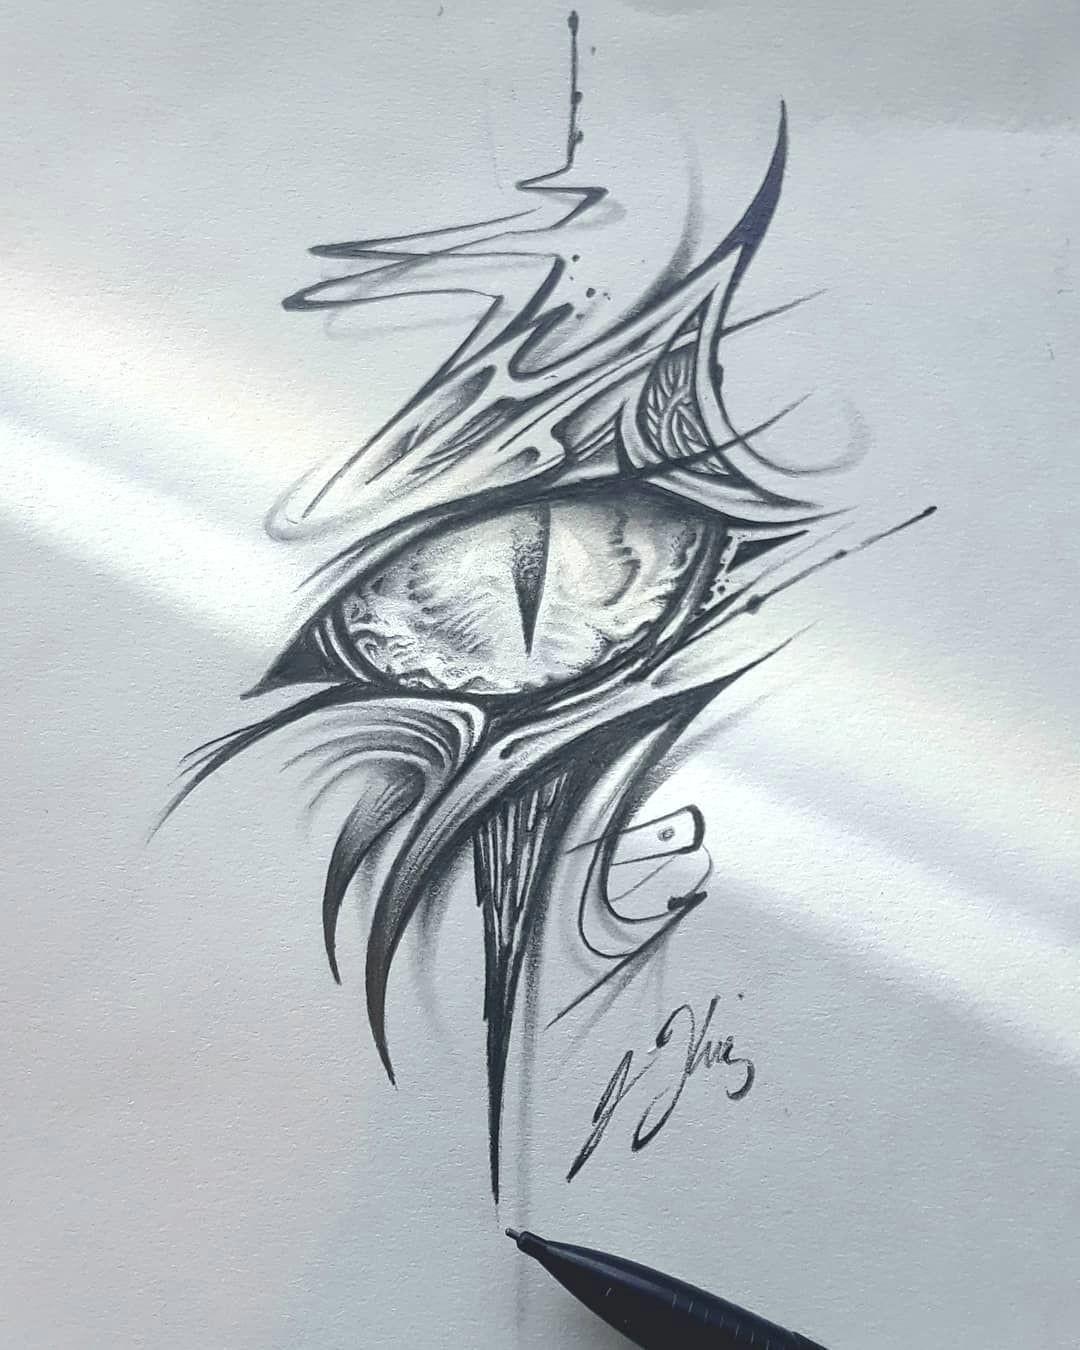 the eye of helios the sun dragon dragon dragoneye tattoo dragoneyetattoo sketch doodle darkart graphicart